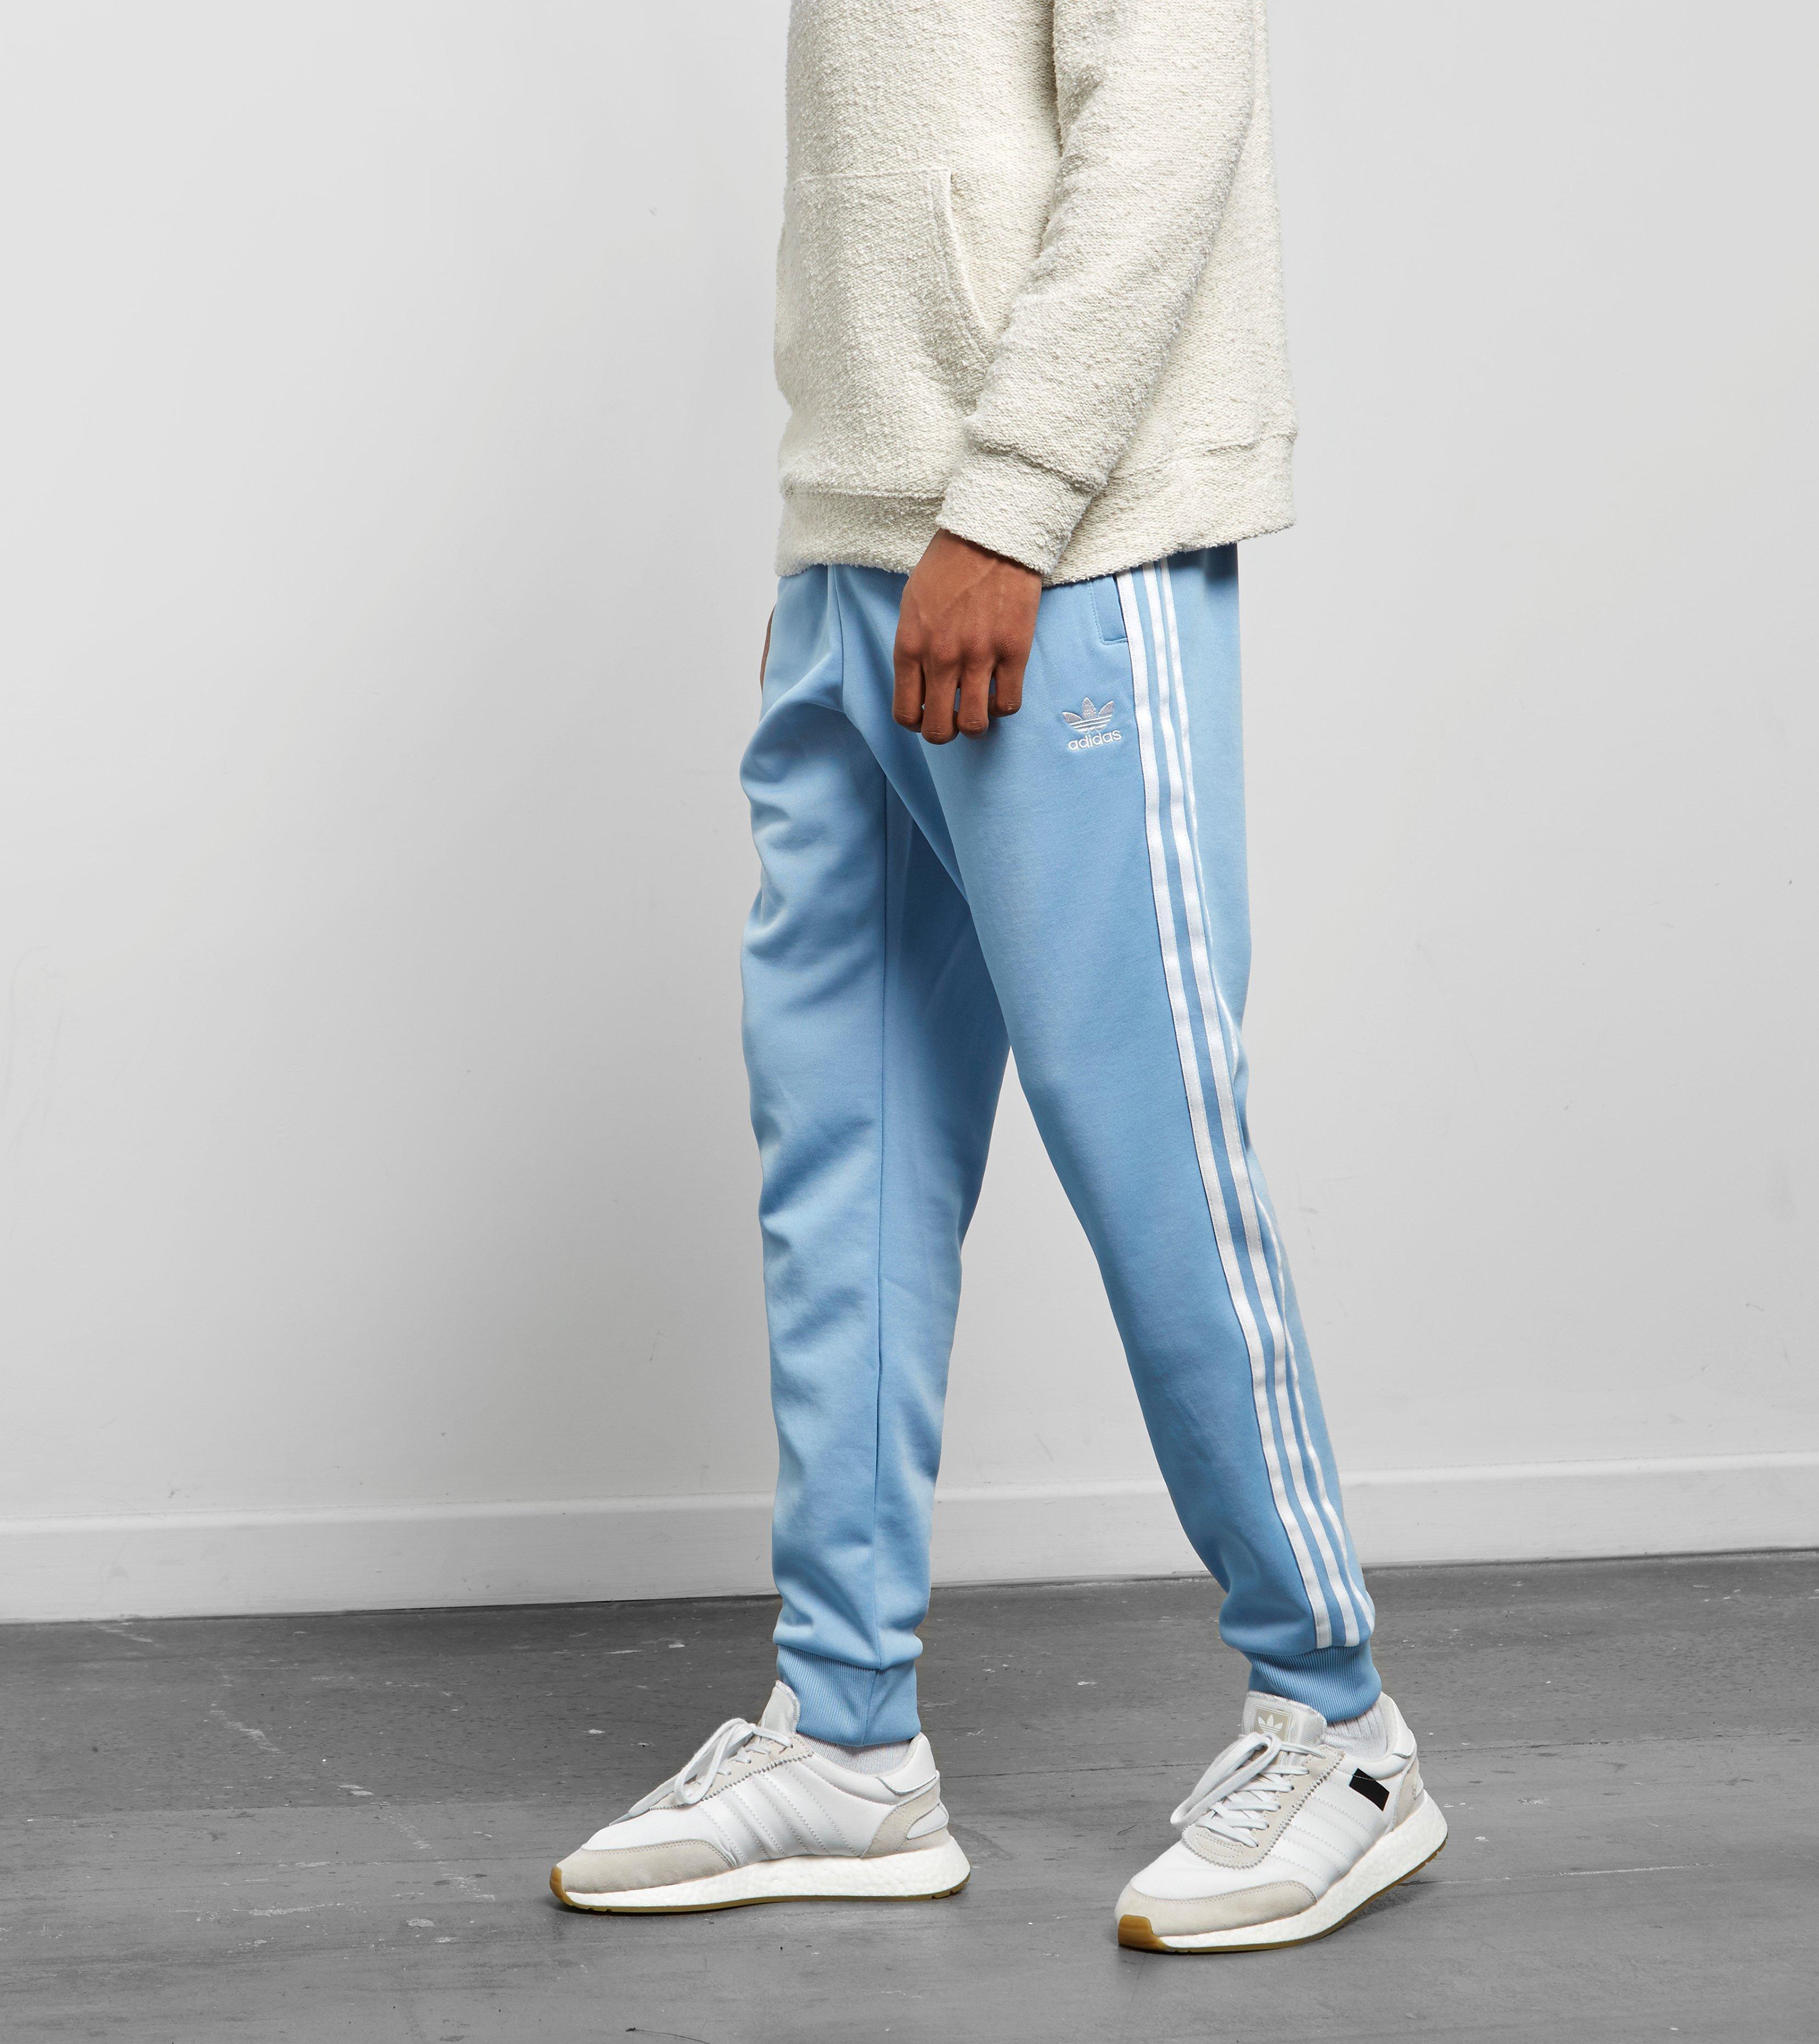 b1a14924595c Lyst - adidas Originals Superstar Track Pants in Blue for Men